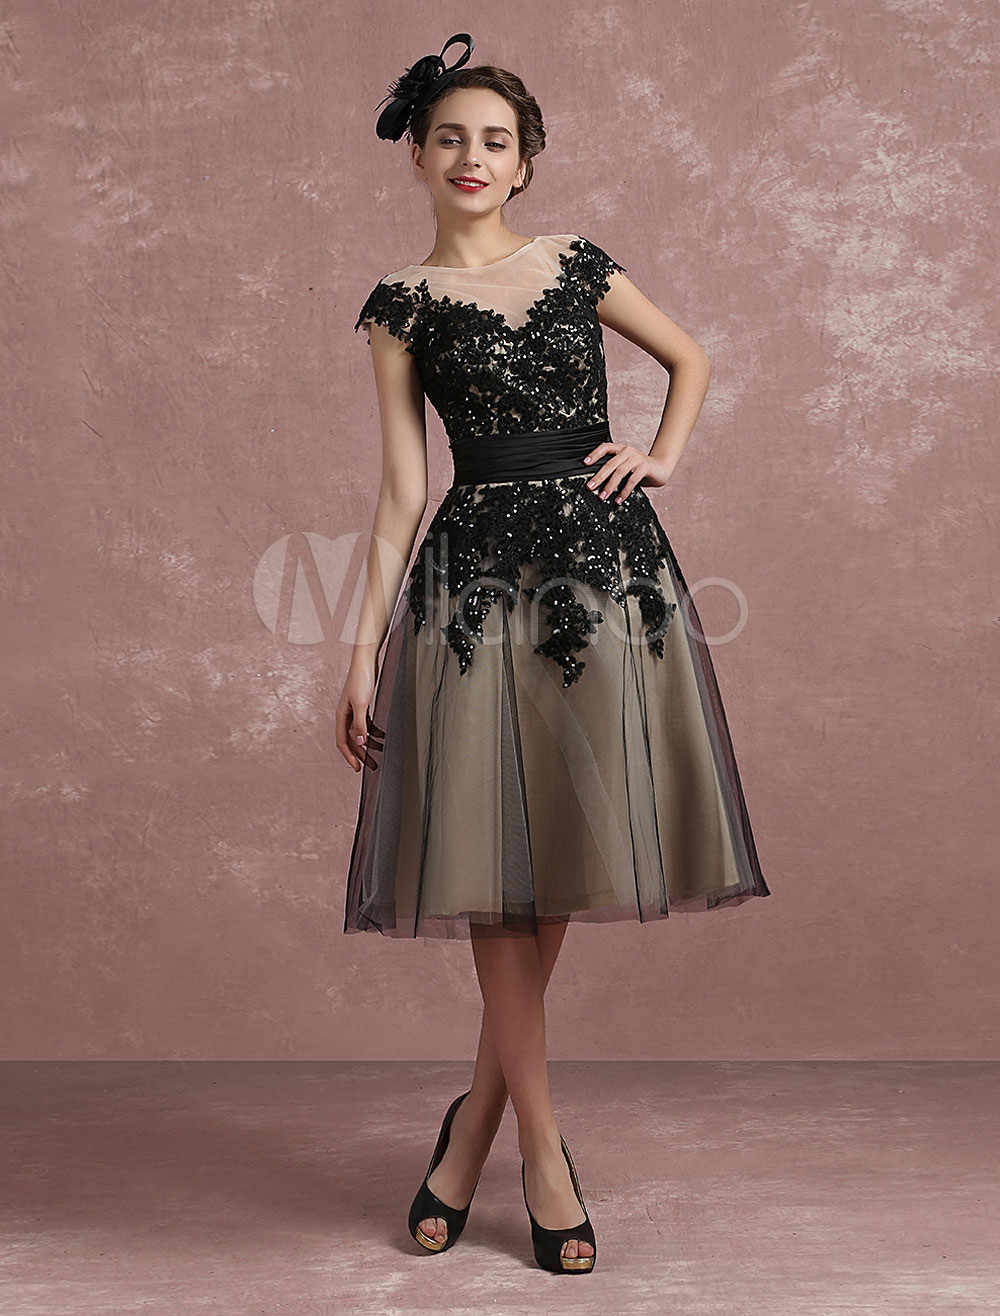 Vintage Cocktail Dress Illusion Lace Applique Beaded Occasion Dress Black Short Sleeve A Line Knee Length Party Dress (Wedding Cocktail Dresses) photo